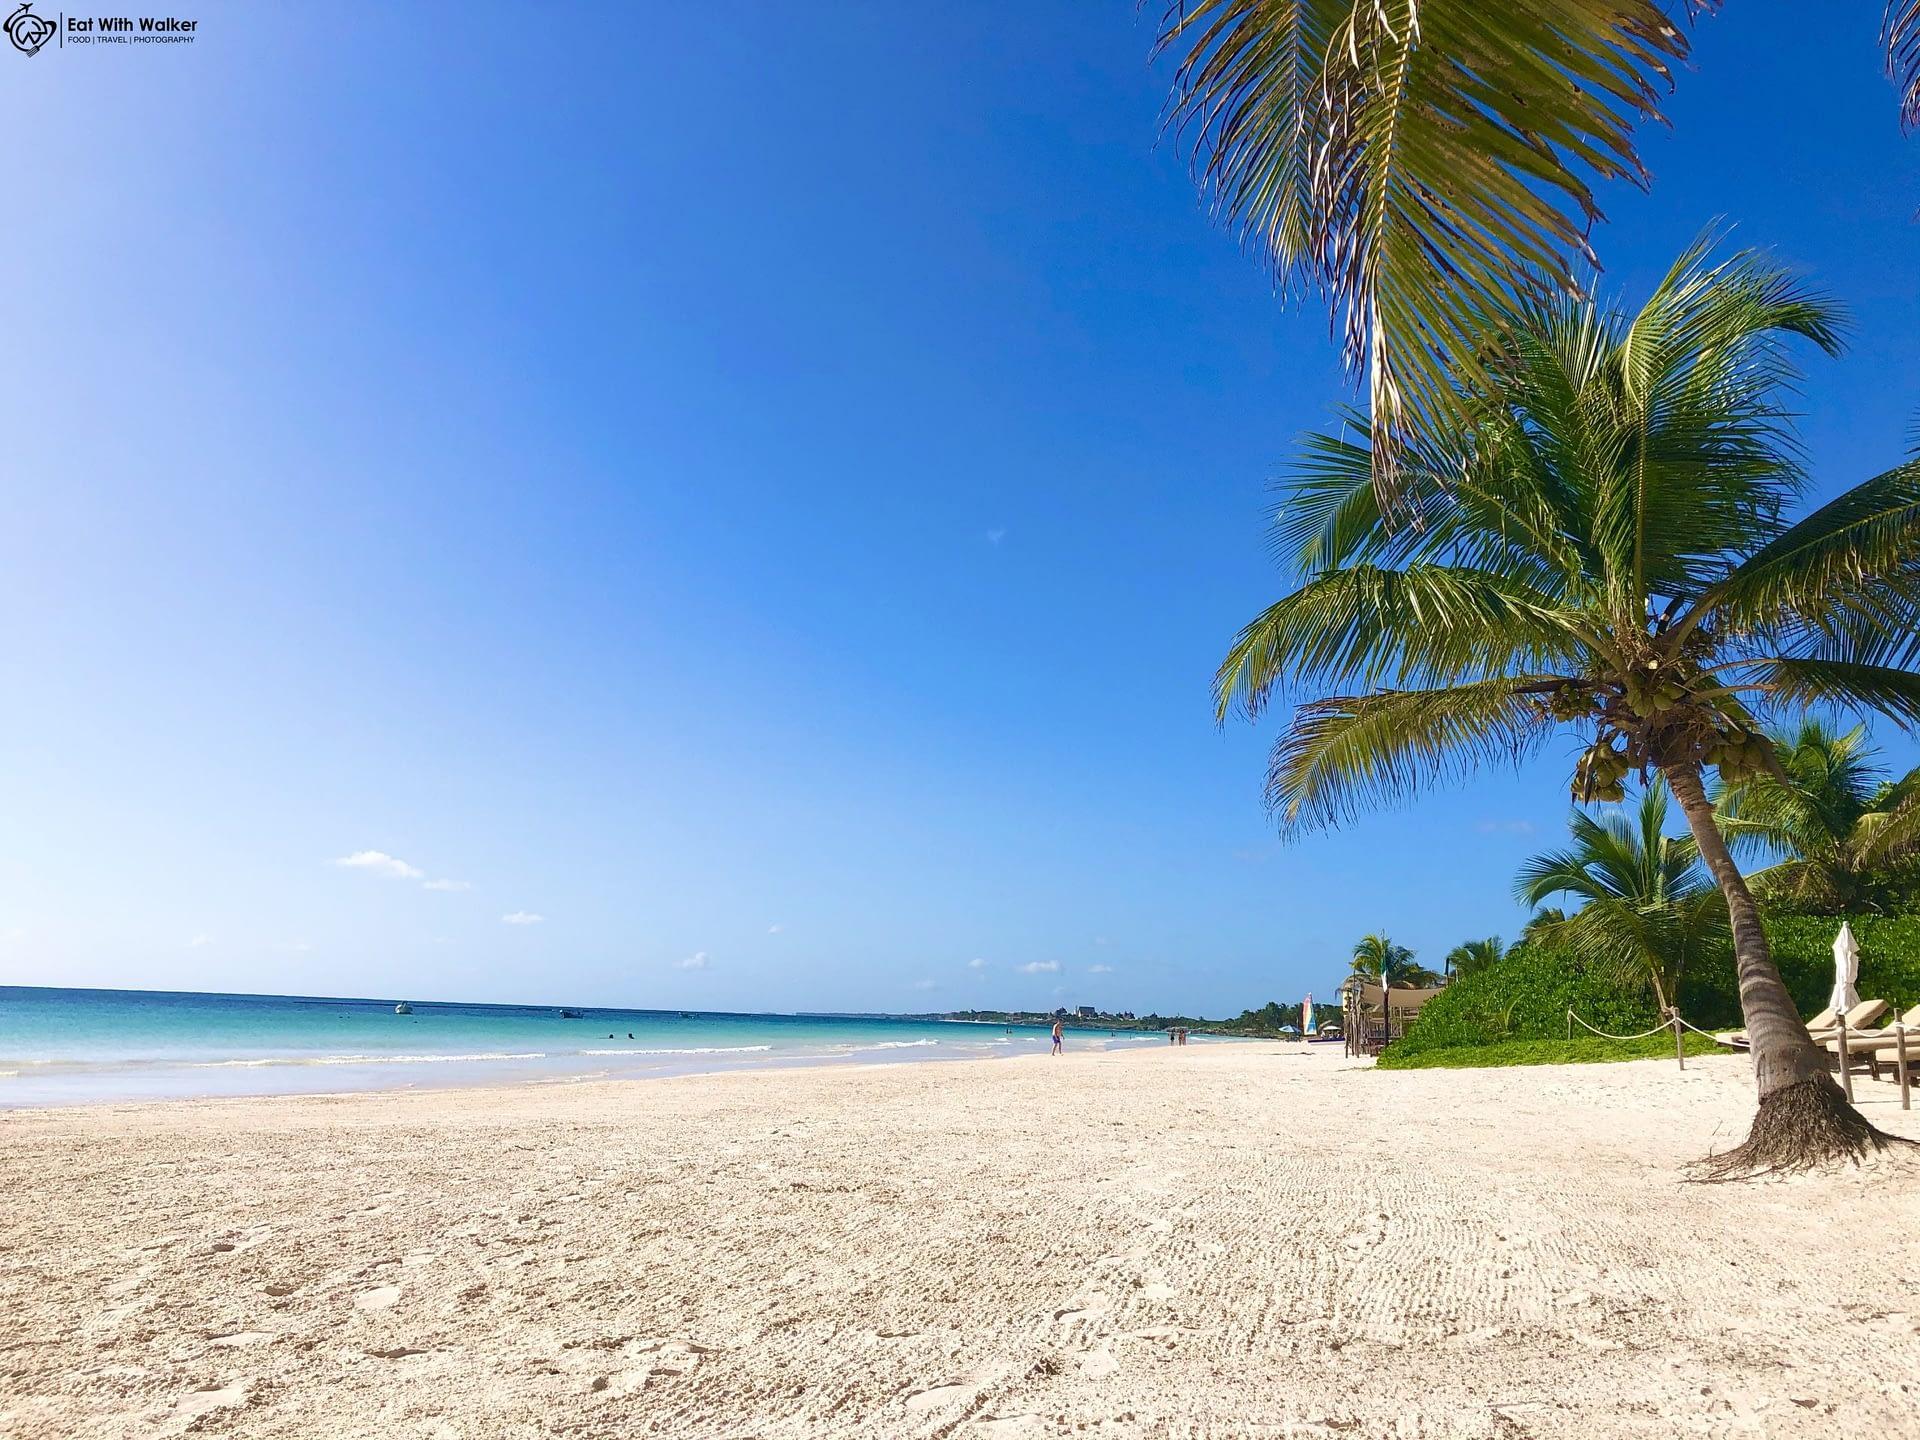 Paraiso Beach - Tulum